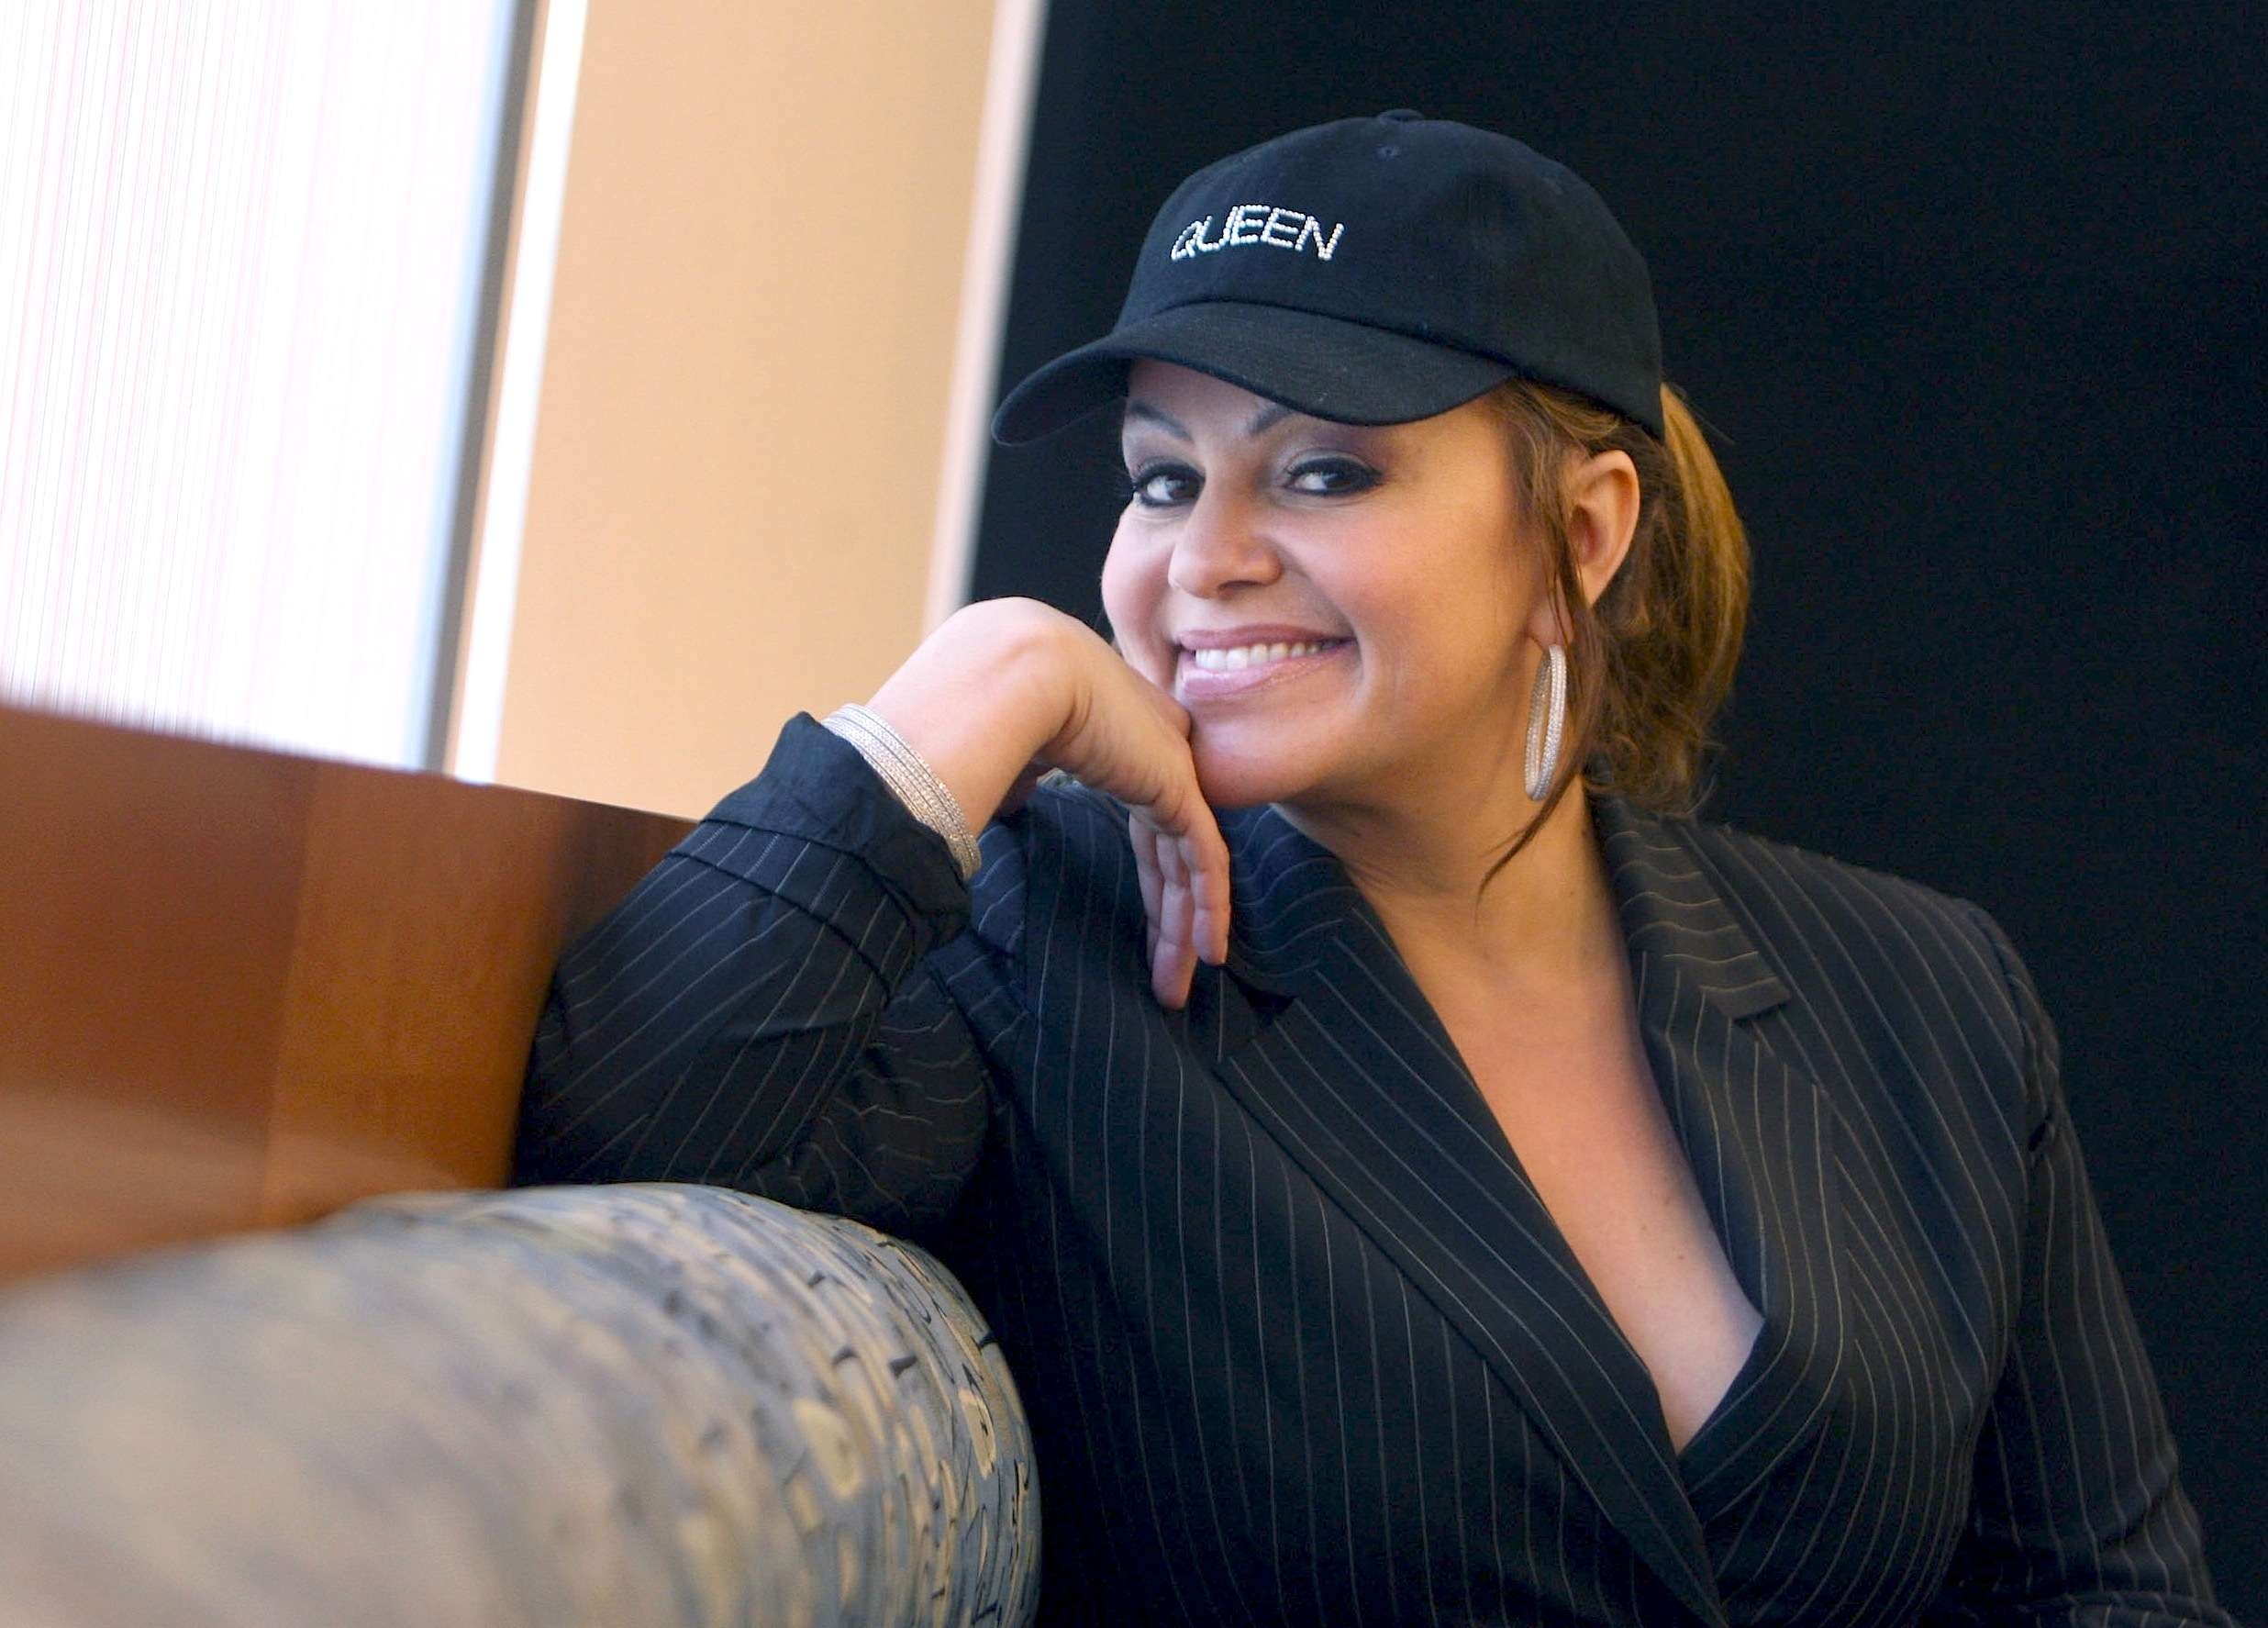 Indigna reality en sitio donde murió Jenni Rivera